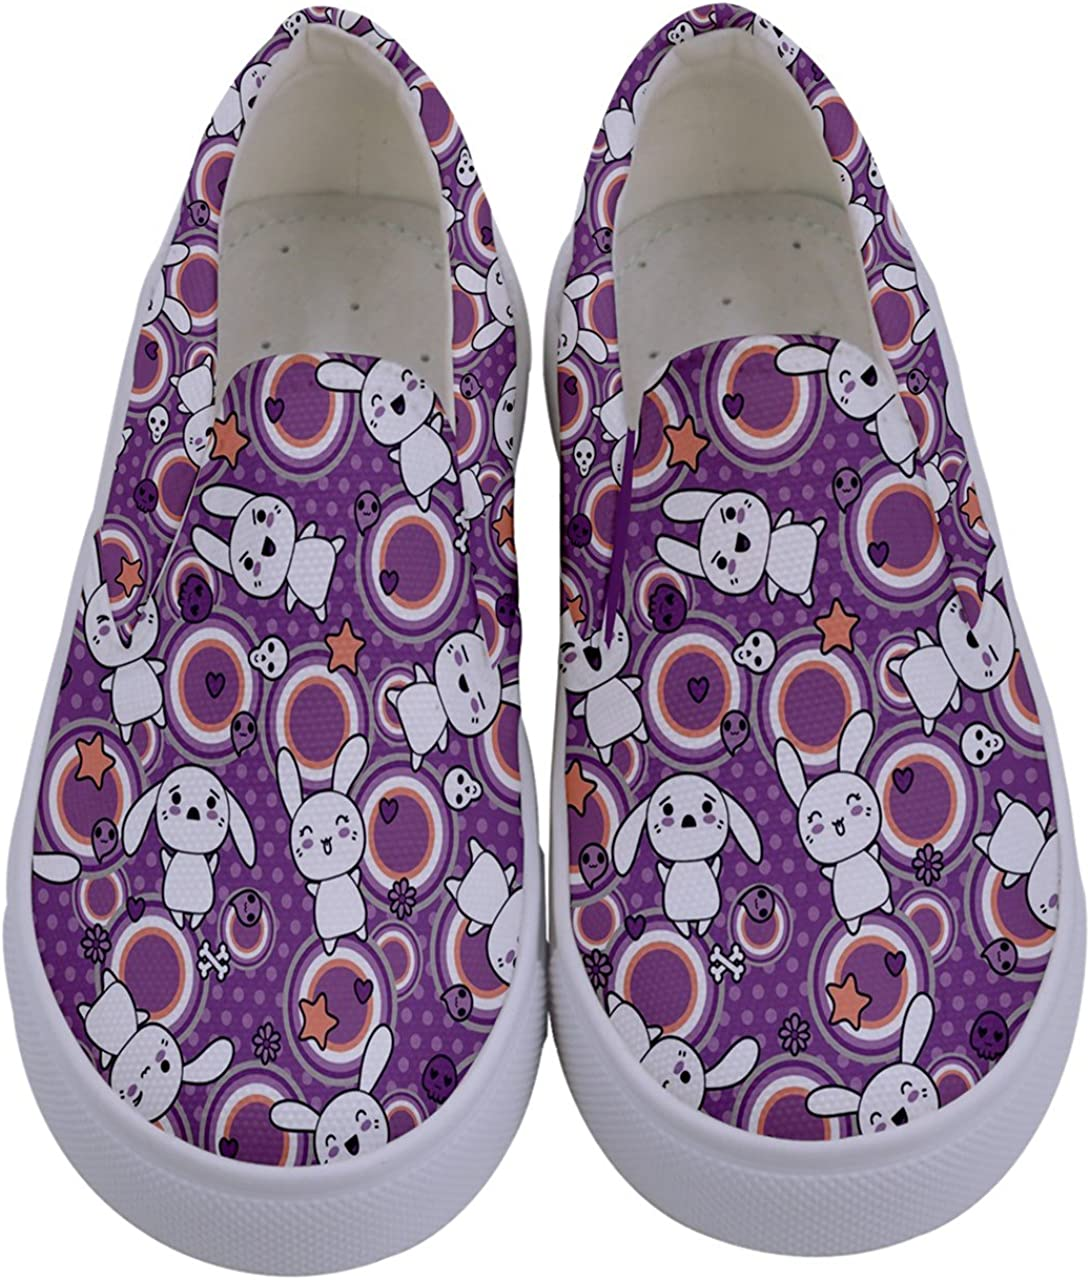 PattyCandy Girls Animals Doodle Kawaii Kids Canvas Slip-On Shoes,Size:US 8C-7Y